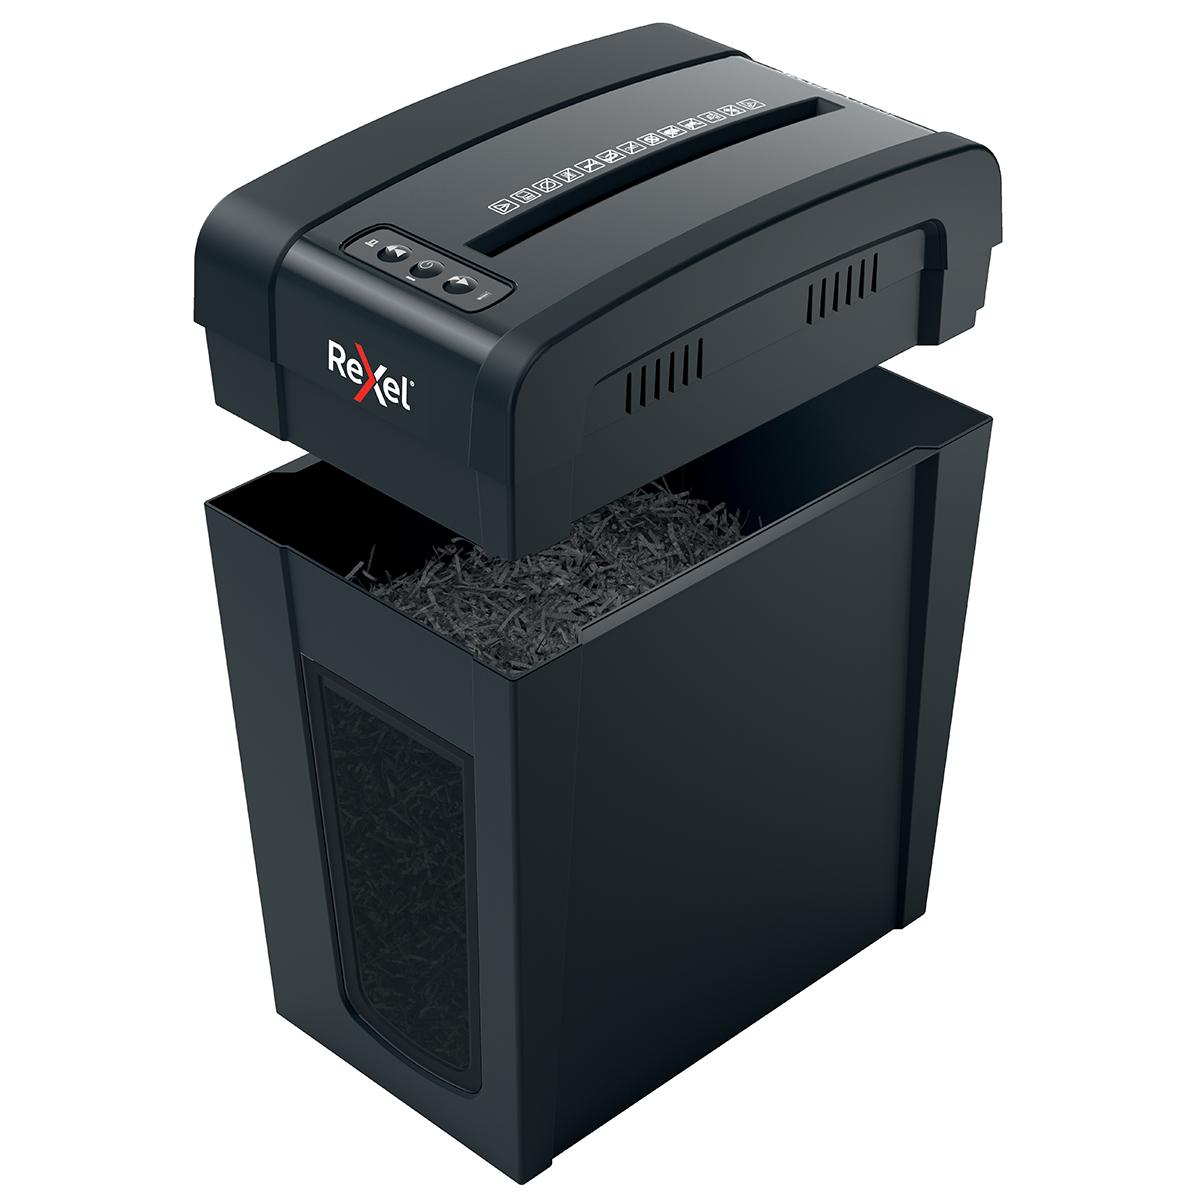 Rexel Secure X10-SL Personal Cross cut Shredder